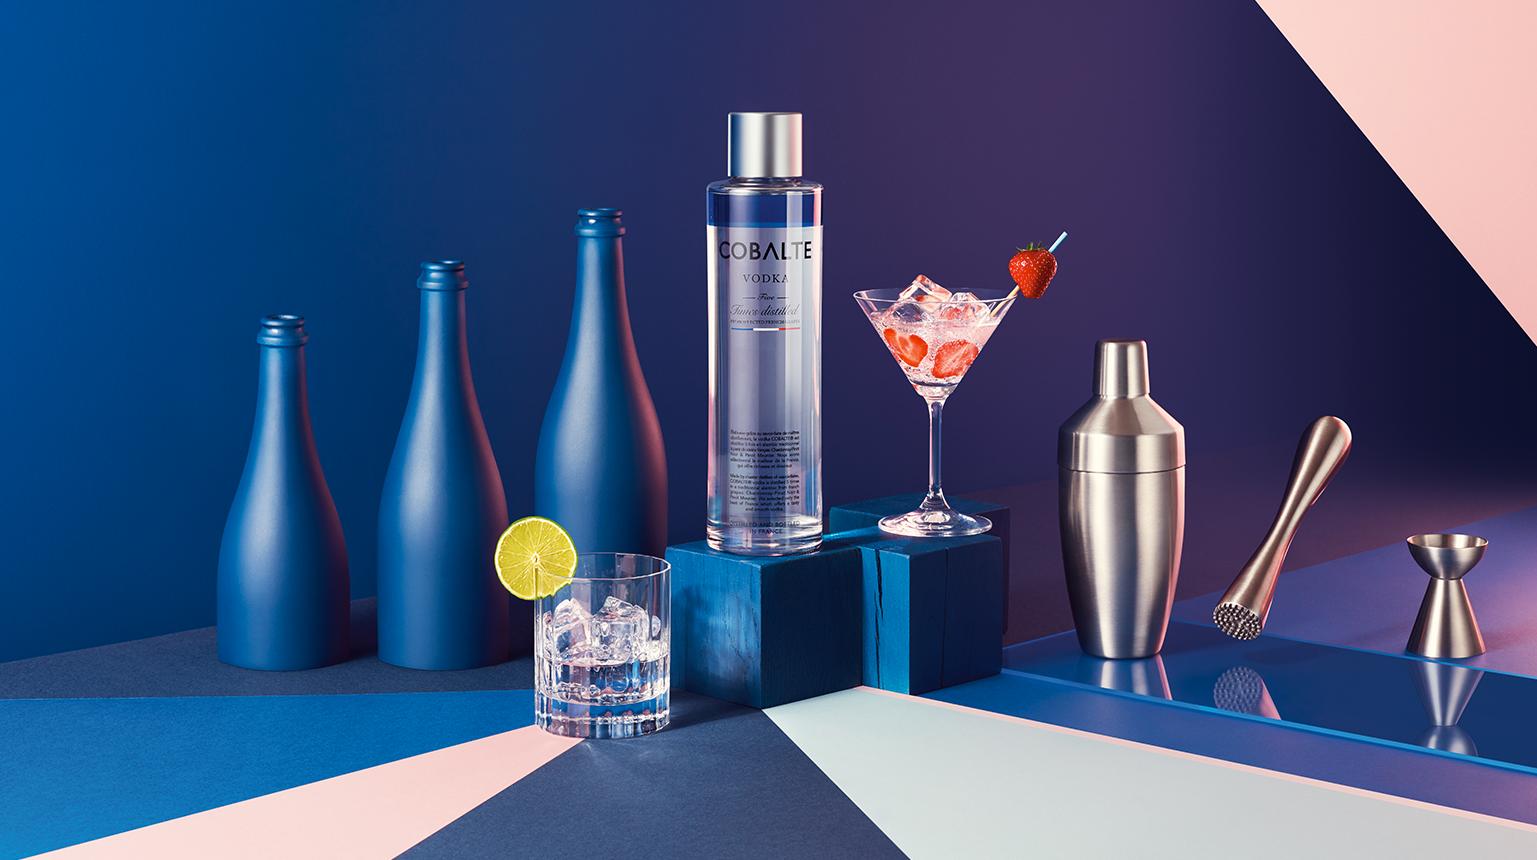 cobalte vodka la marque de vodka fran aise haut de gamme. Black Bedroom Furniture Sets. Home Design Ideas